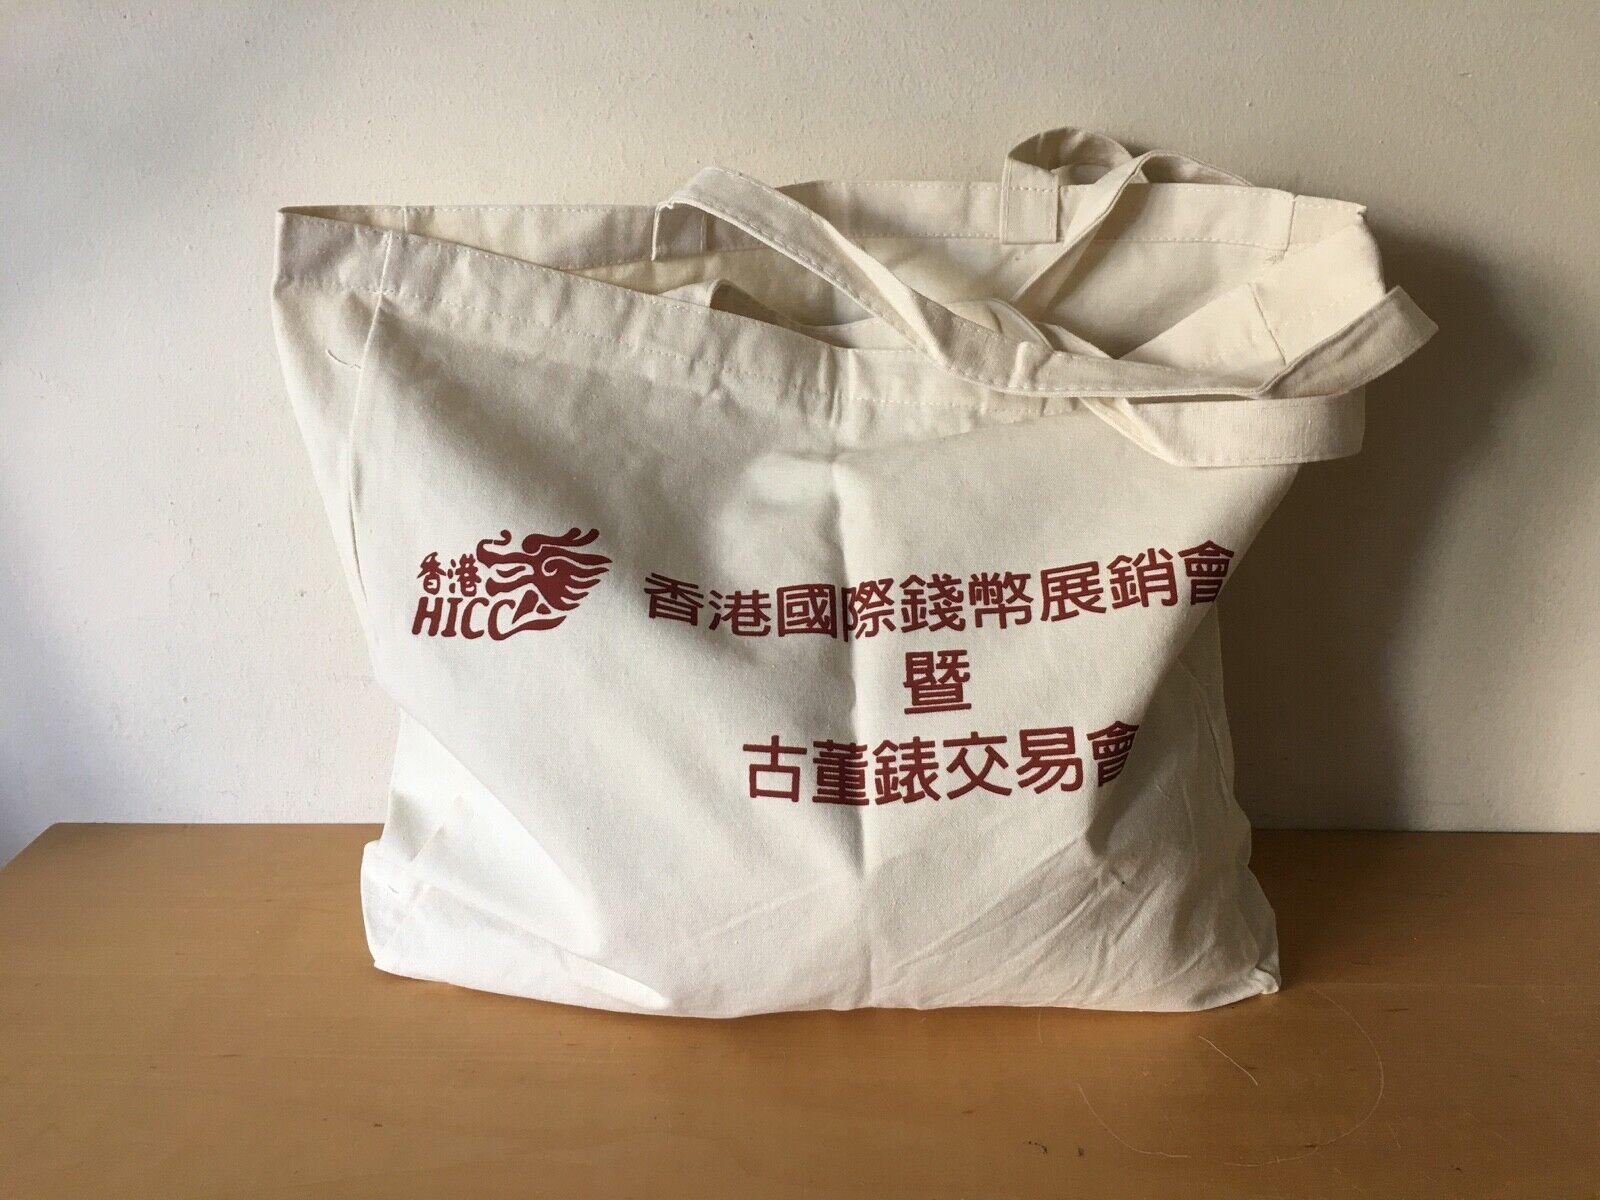 New - Bag H. I. C. Hong Kong International Coin Convention - Bag - Canvas Canvas